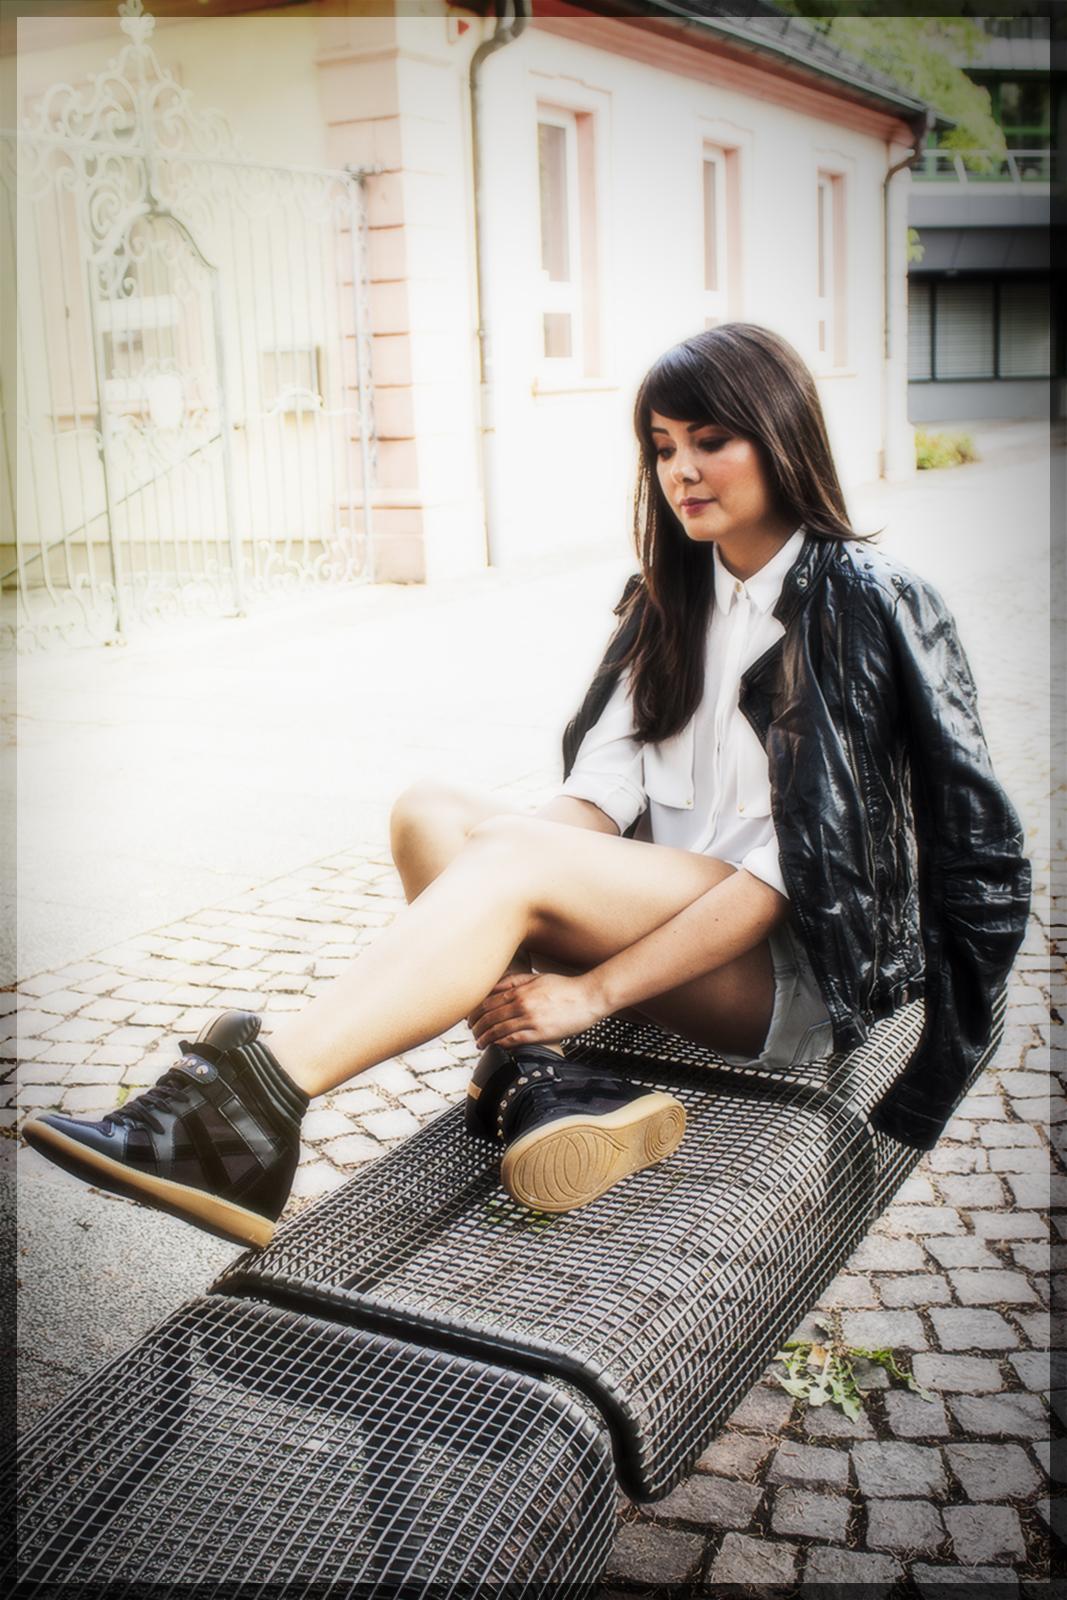 fashionambit-fashionblog-muenchen-styleblog-munich-blogger-deutschland-fashionblogger-bloggerdeutschland-style-blog-lifestyle-blog-modeblog-lederjacke-